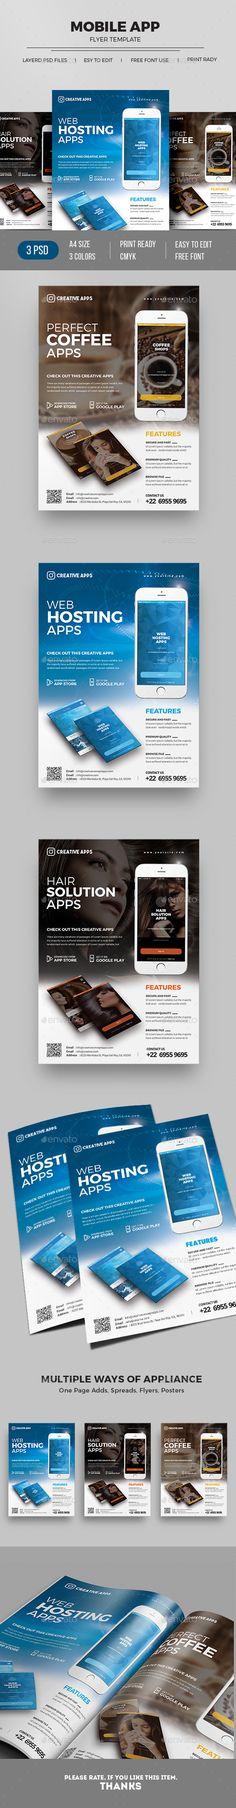 Android App Design, Android Apps, Ad Design, Flyer Design, Graphic Design, App Promotion, Promotional Flyers, Flyer Printing, Catalog Design